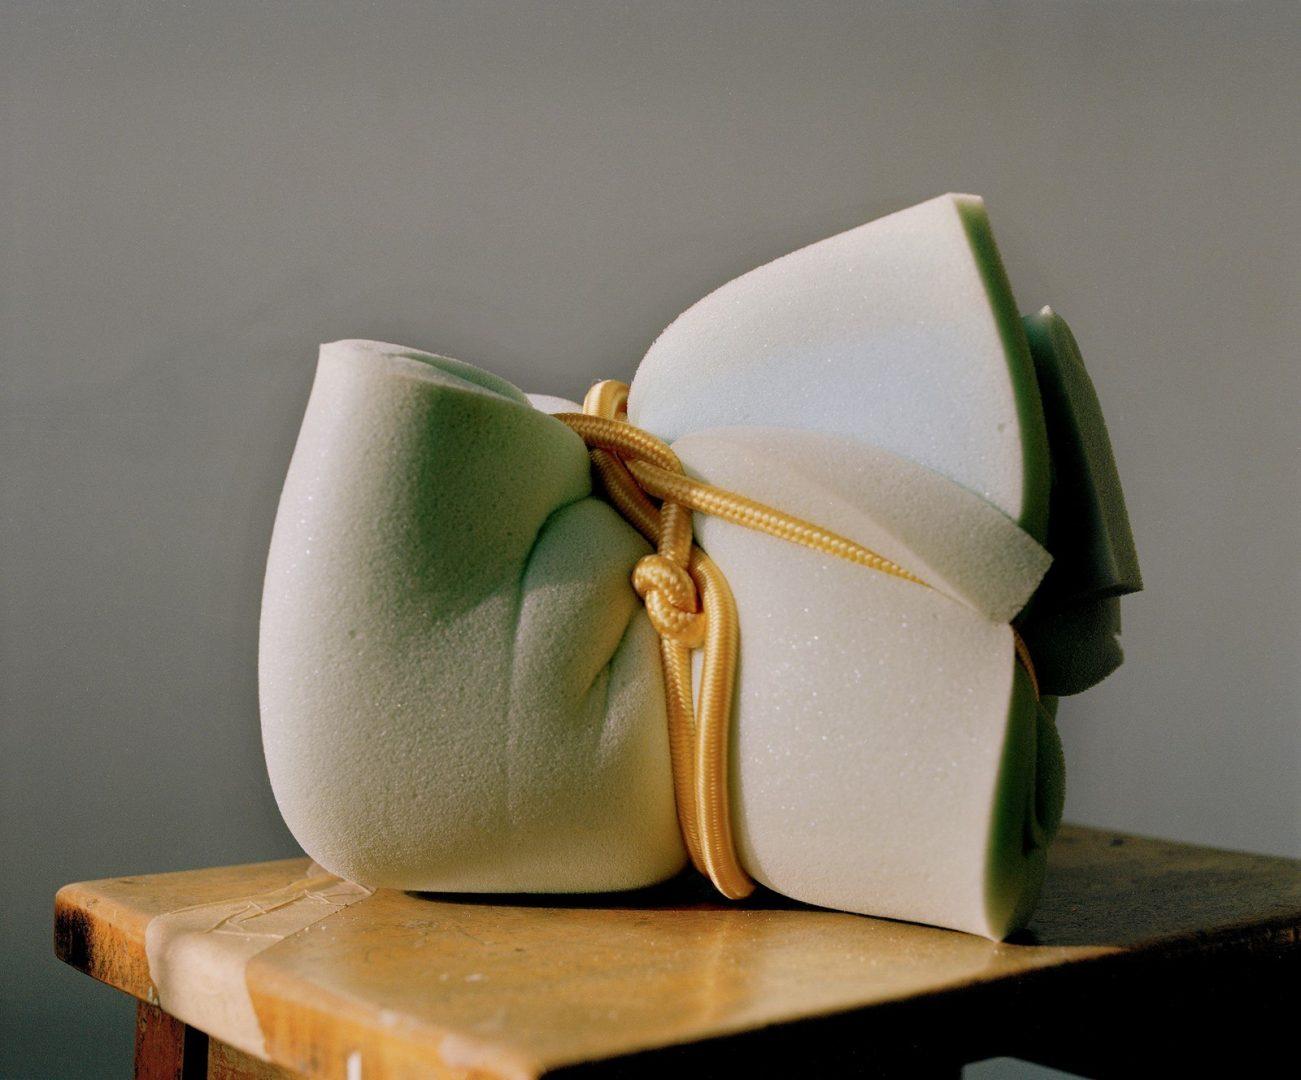 Tine Bek creates soft sculptures inspired by Danish desserts